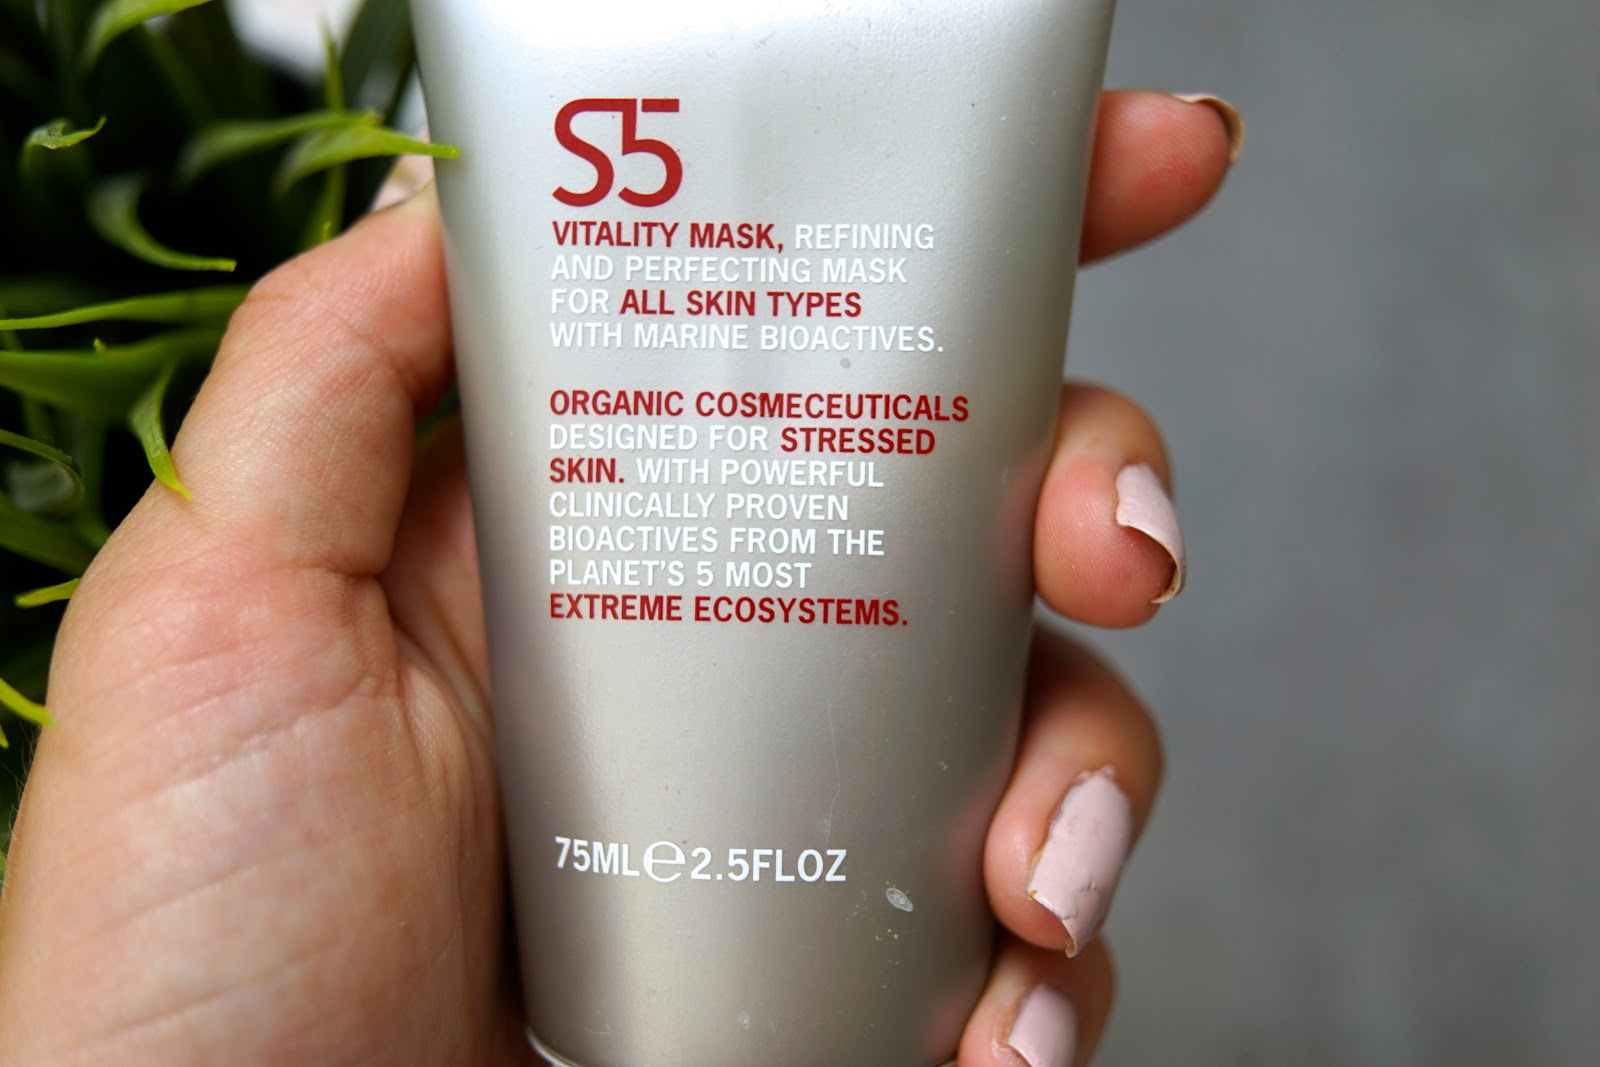 S5 Vitality Mask